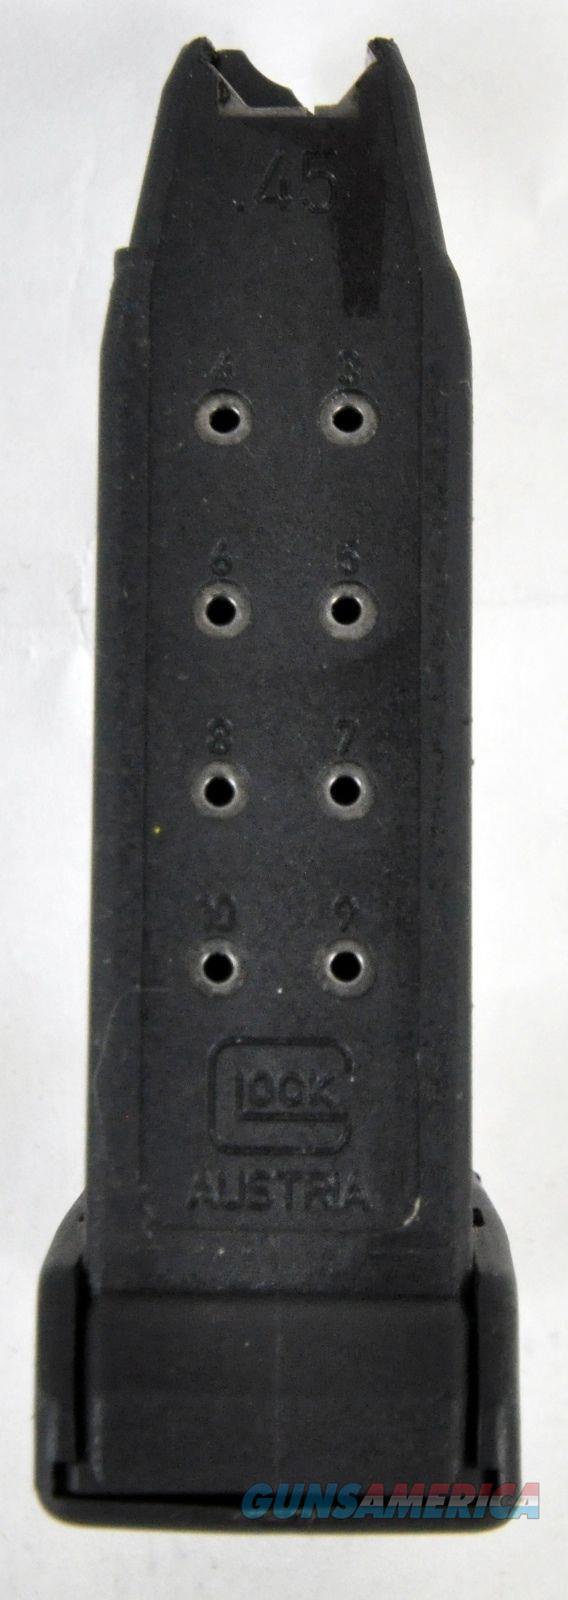 Glock 30 .45 ACP 10 Round Magazine Mag - MF30010  Non-Guns > Magazines & Clips > Pistol Magazines > Glock